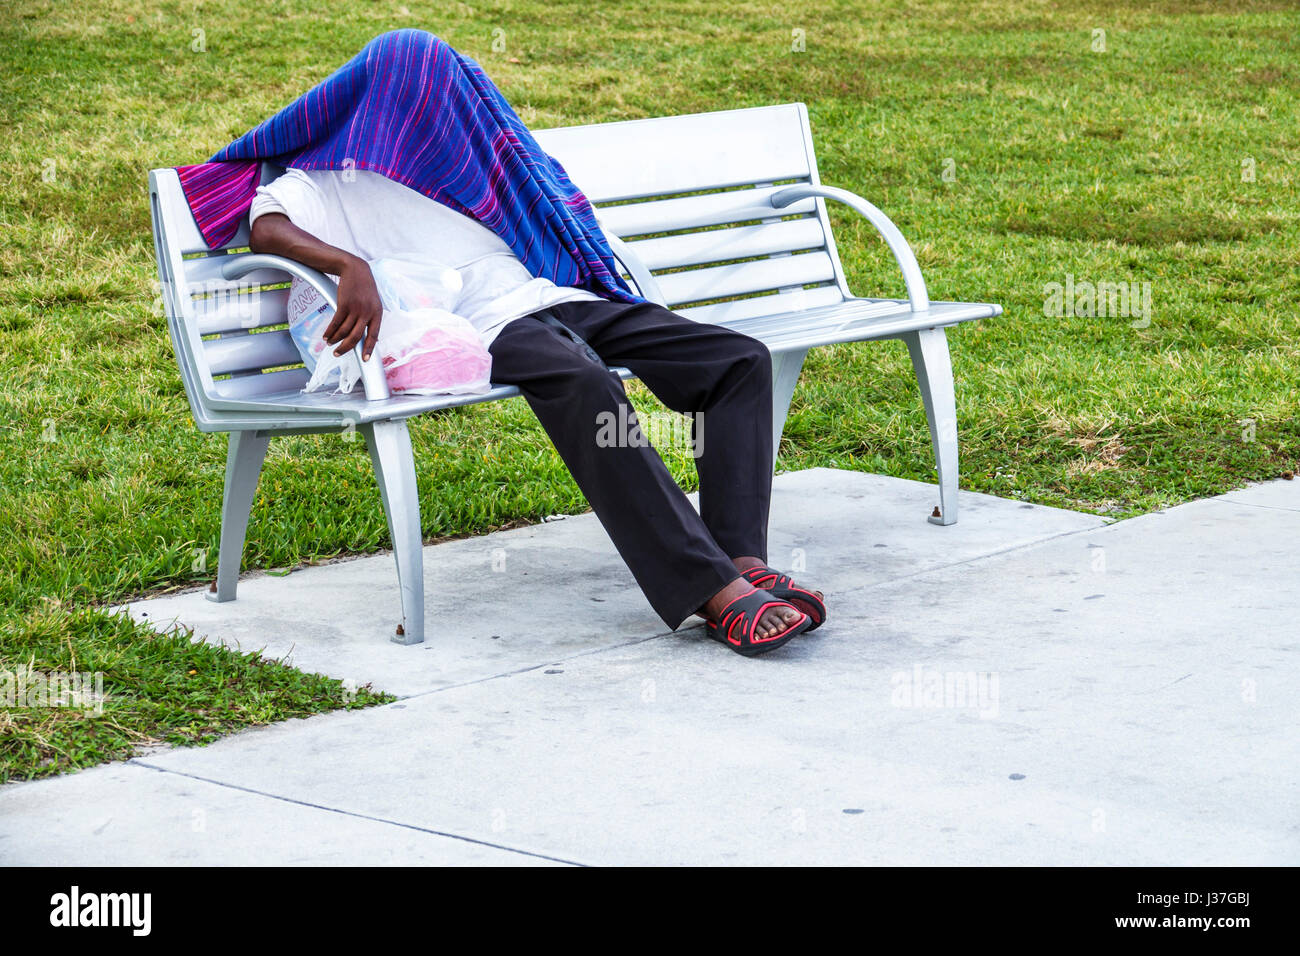 Miami Beach Florida Lummus Park park bench Black man sleeping covered face head blanket hiding mental health illness - Stock Image